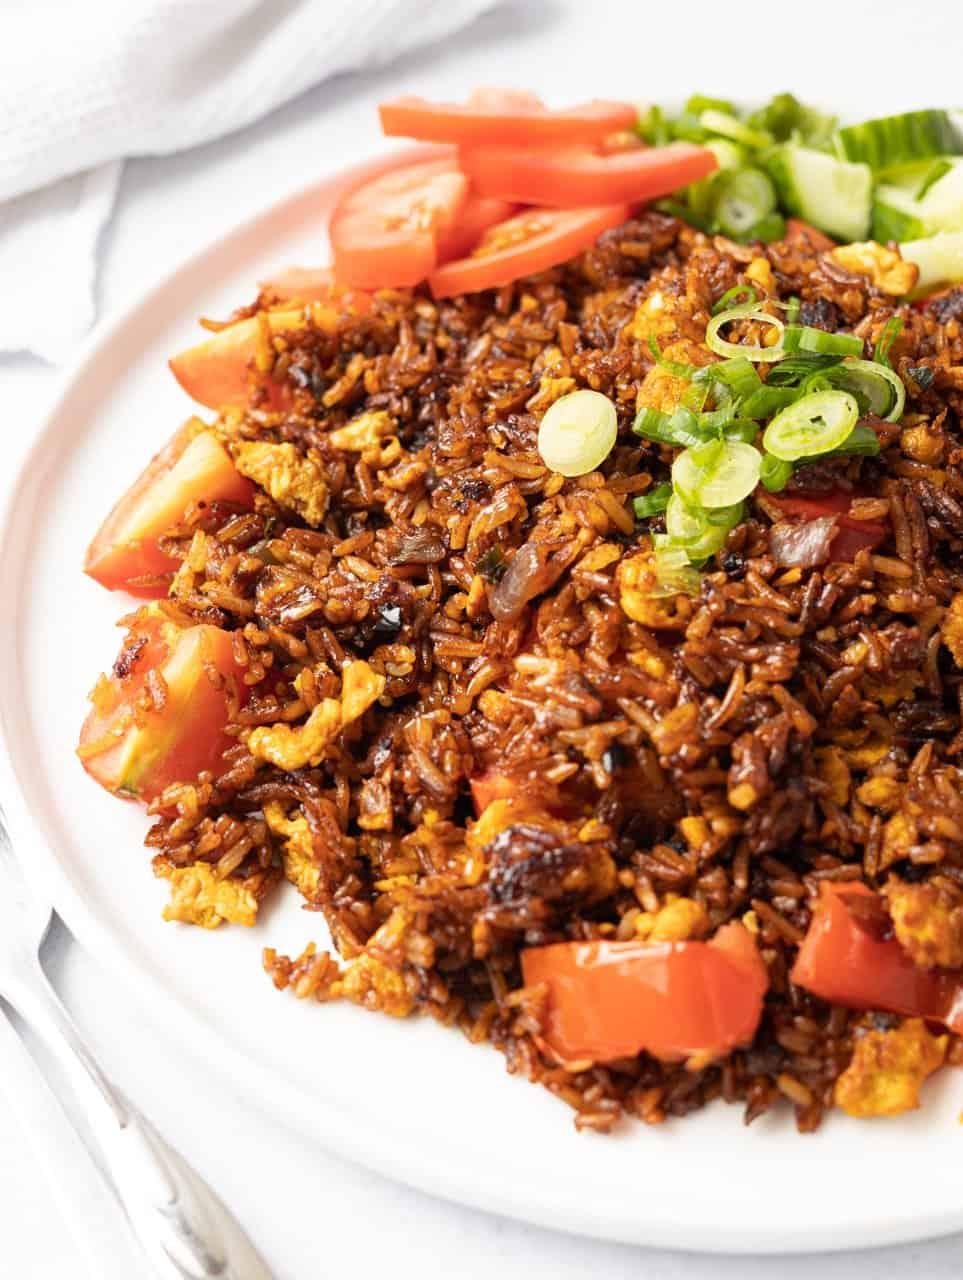 Thai Railway Fried Rice